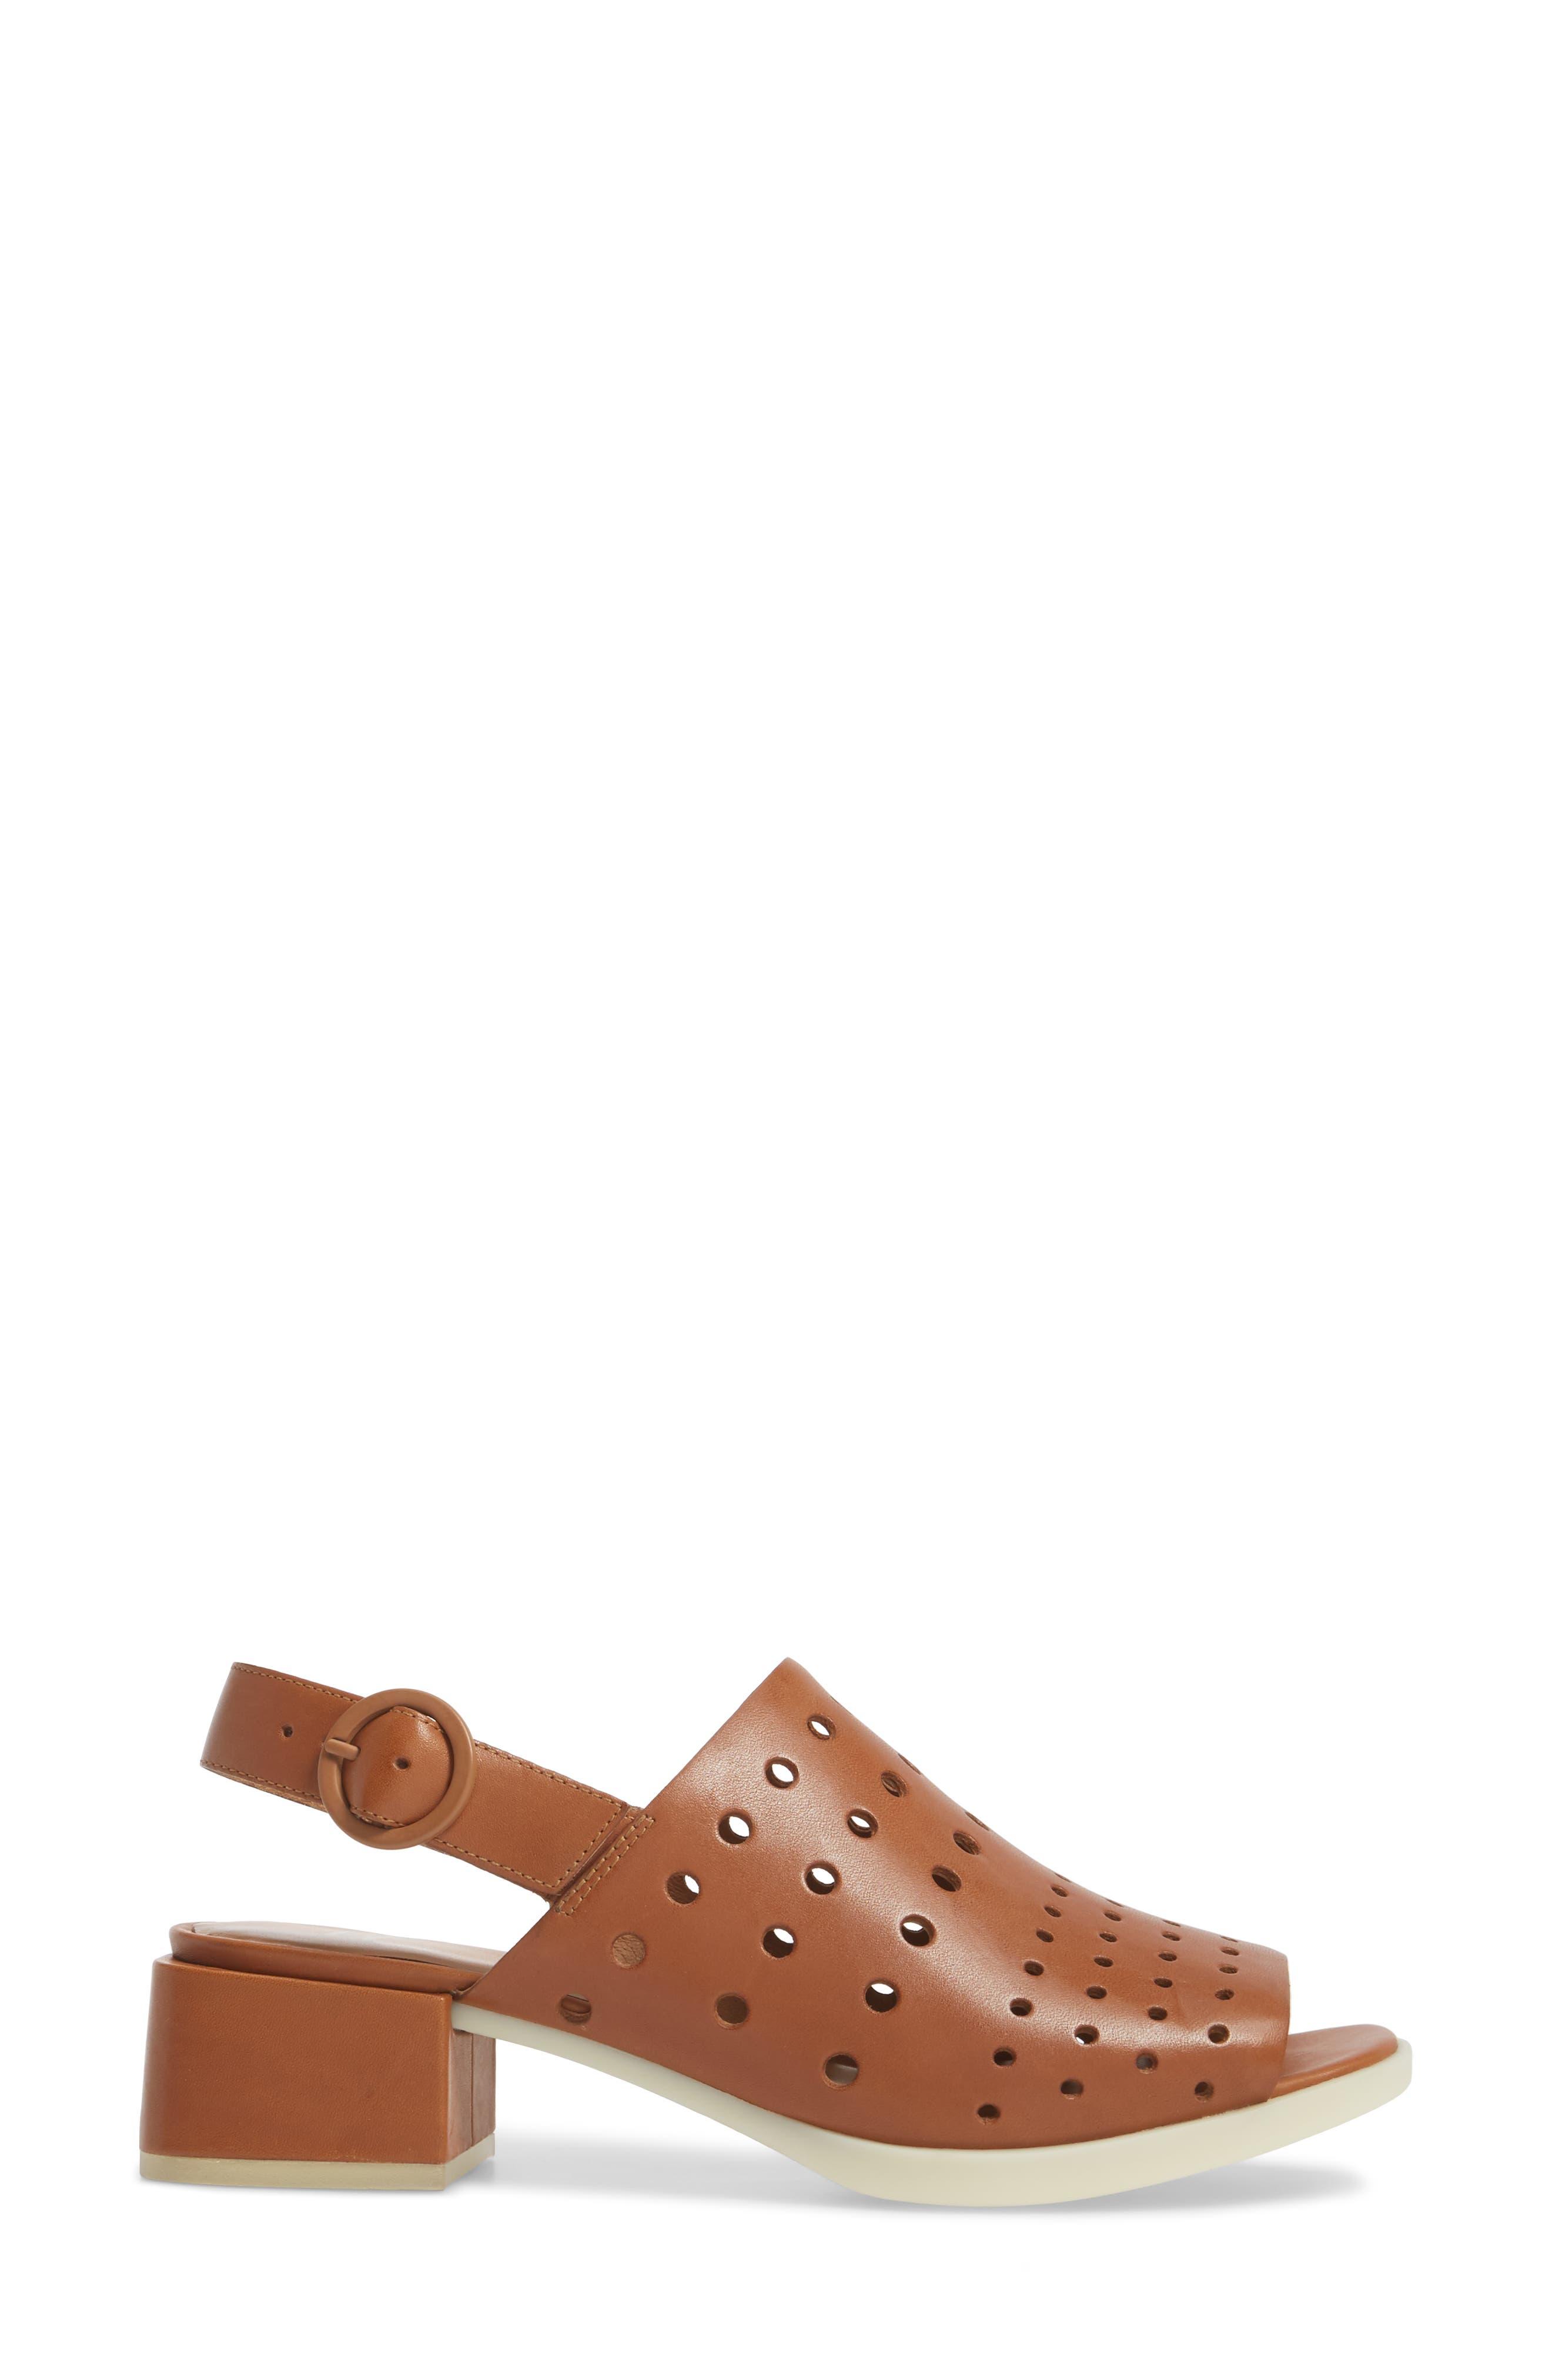 Twins Sandal,                             Alternate thumbnail 3, color,                             Rust/ Copper Leather